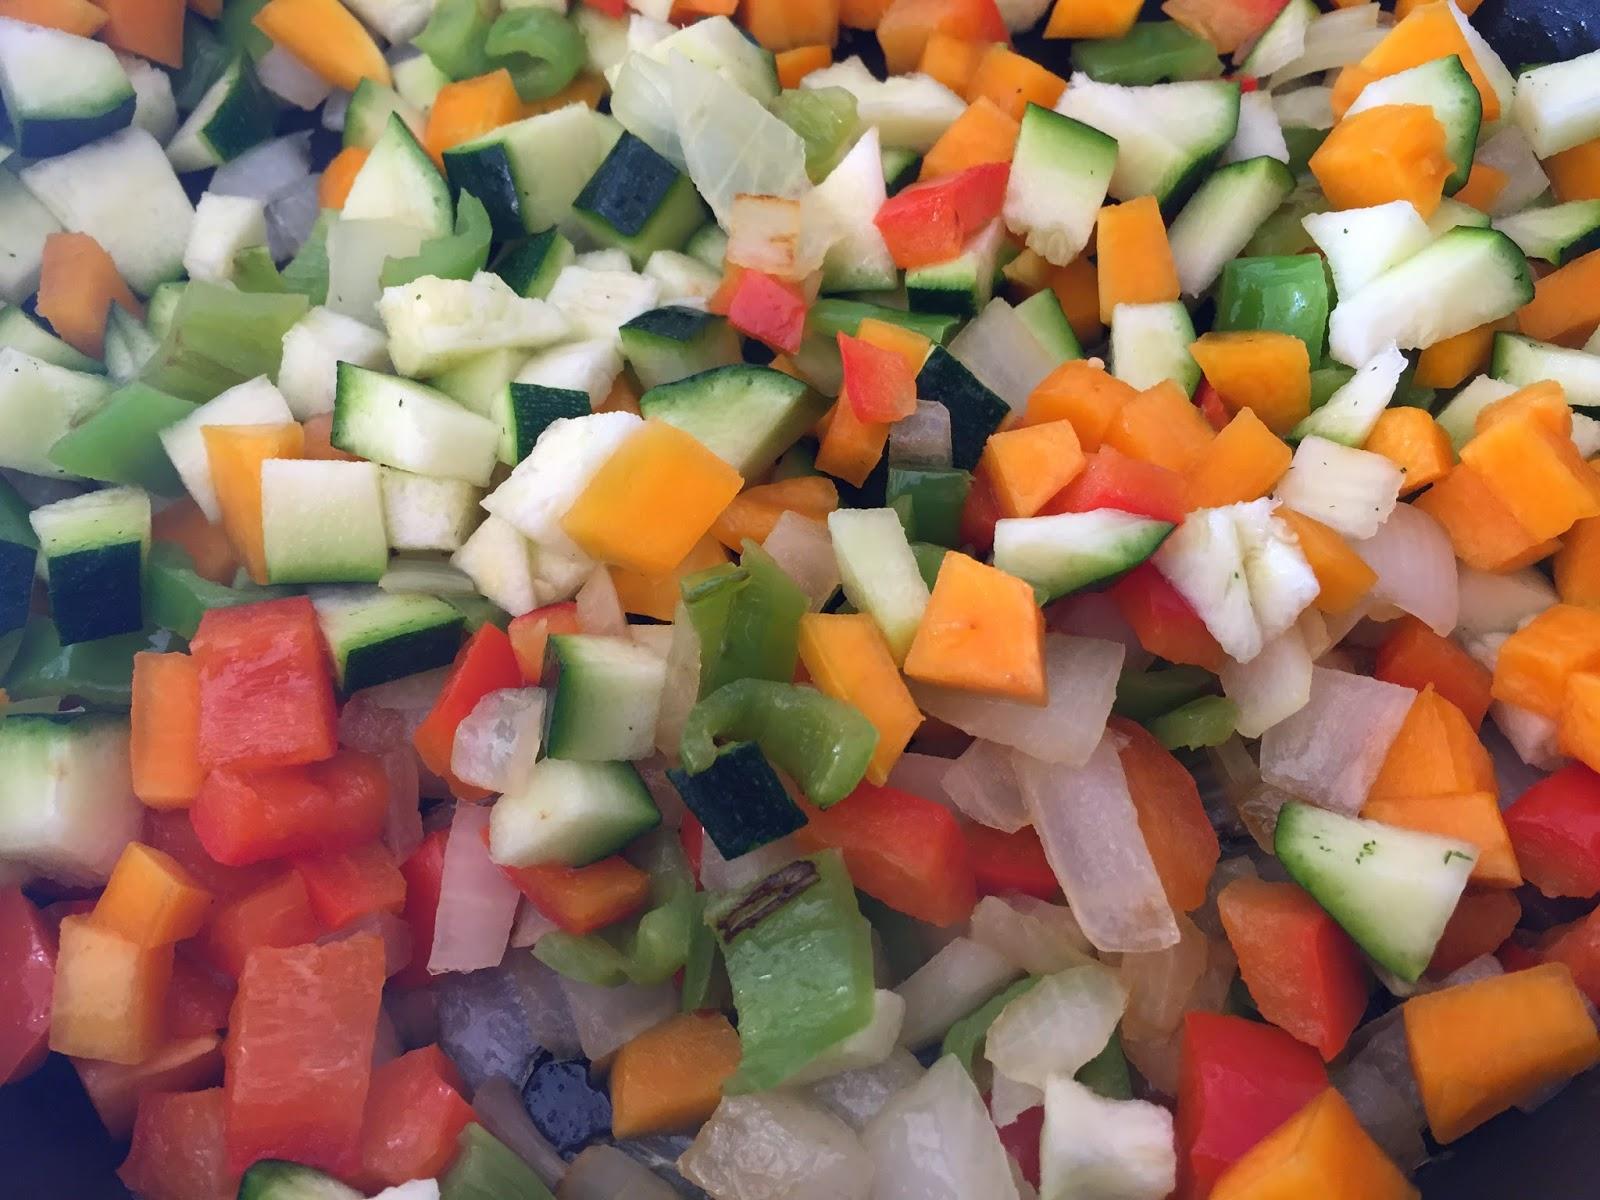 Espaguetis con verduras y salsa de soja, friendo las verduras.